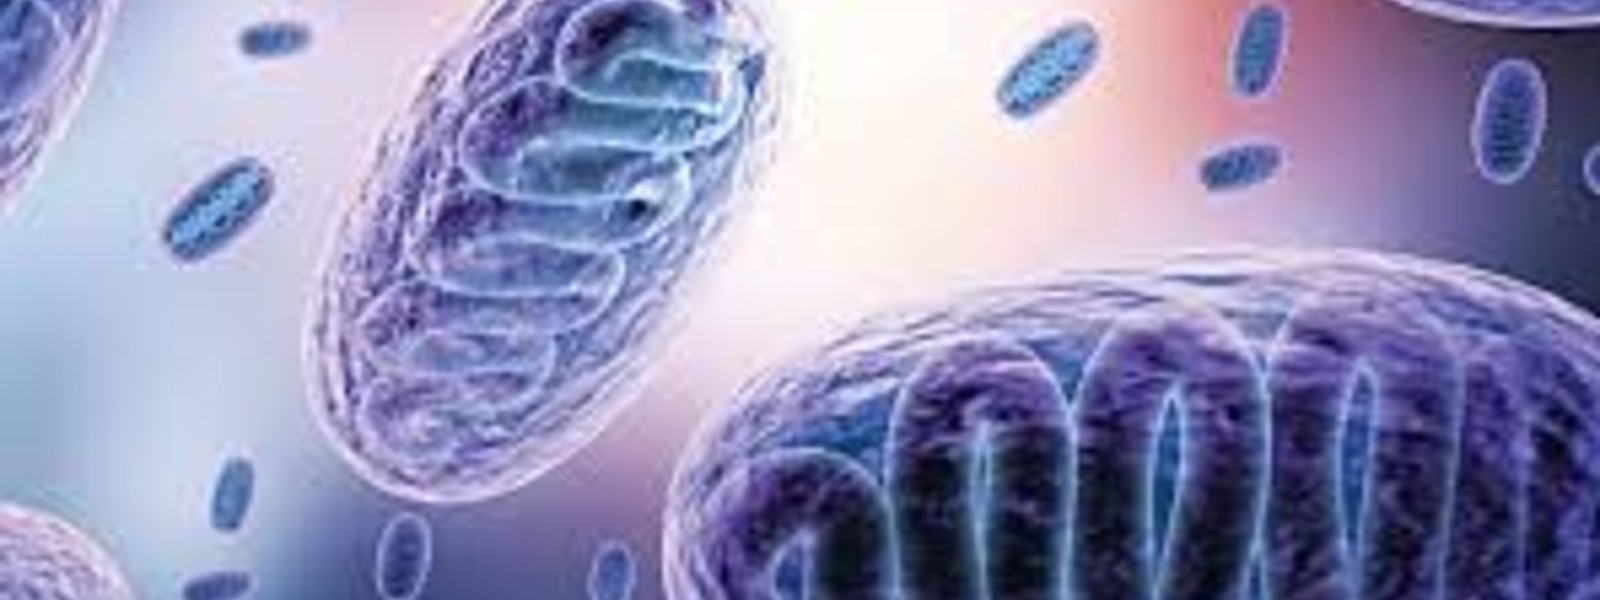 """Black Fungus can be treated and no need to panic,"" – Dr. Primali Jayasekara"